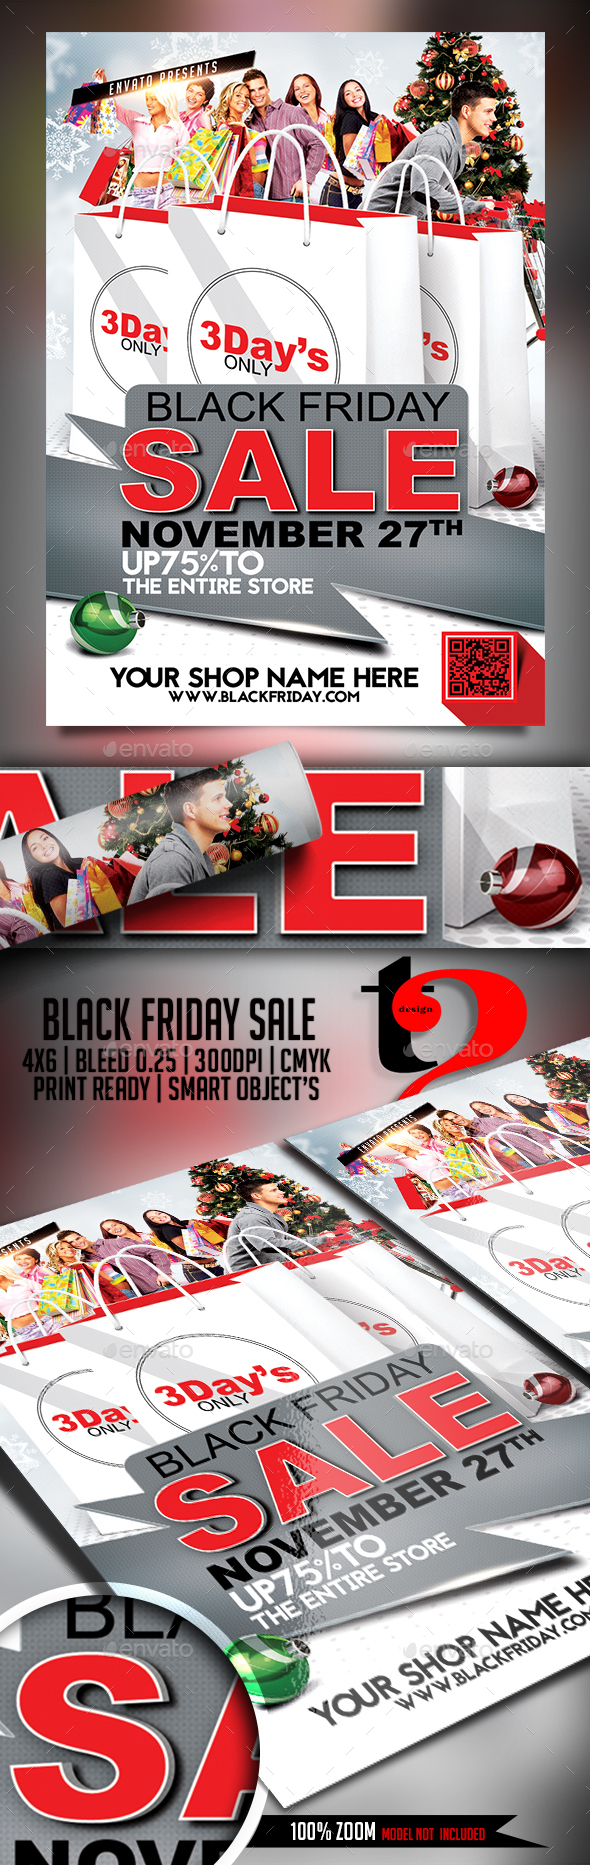 Black Friday Flyer Template - Flyers Print Templates